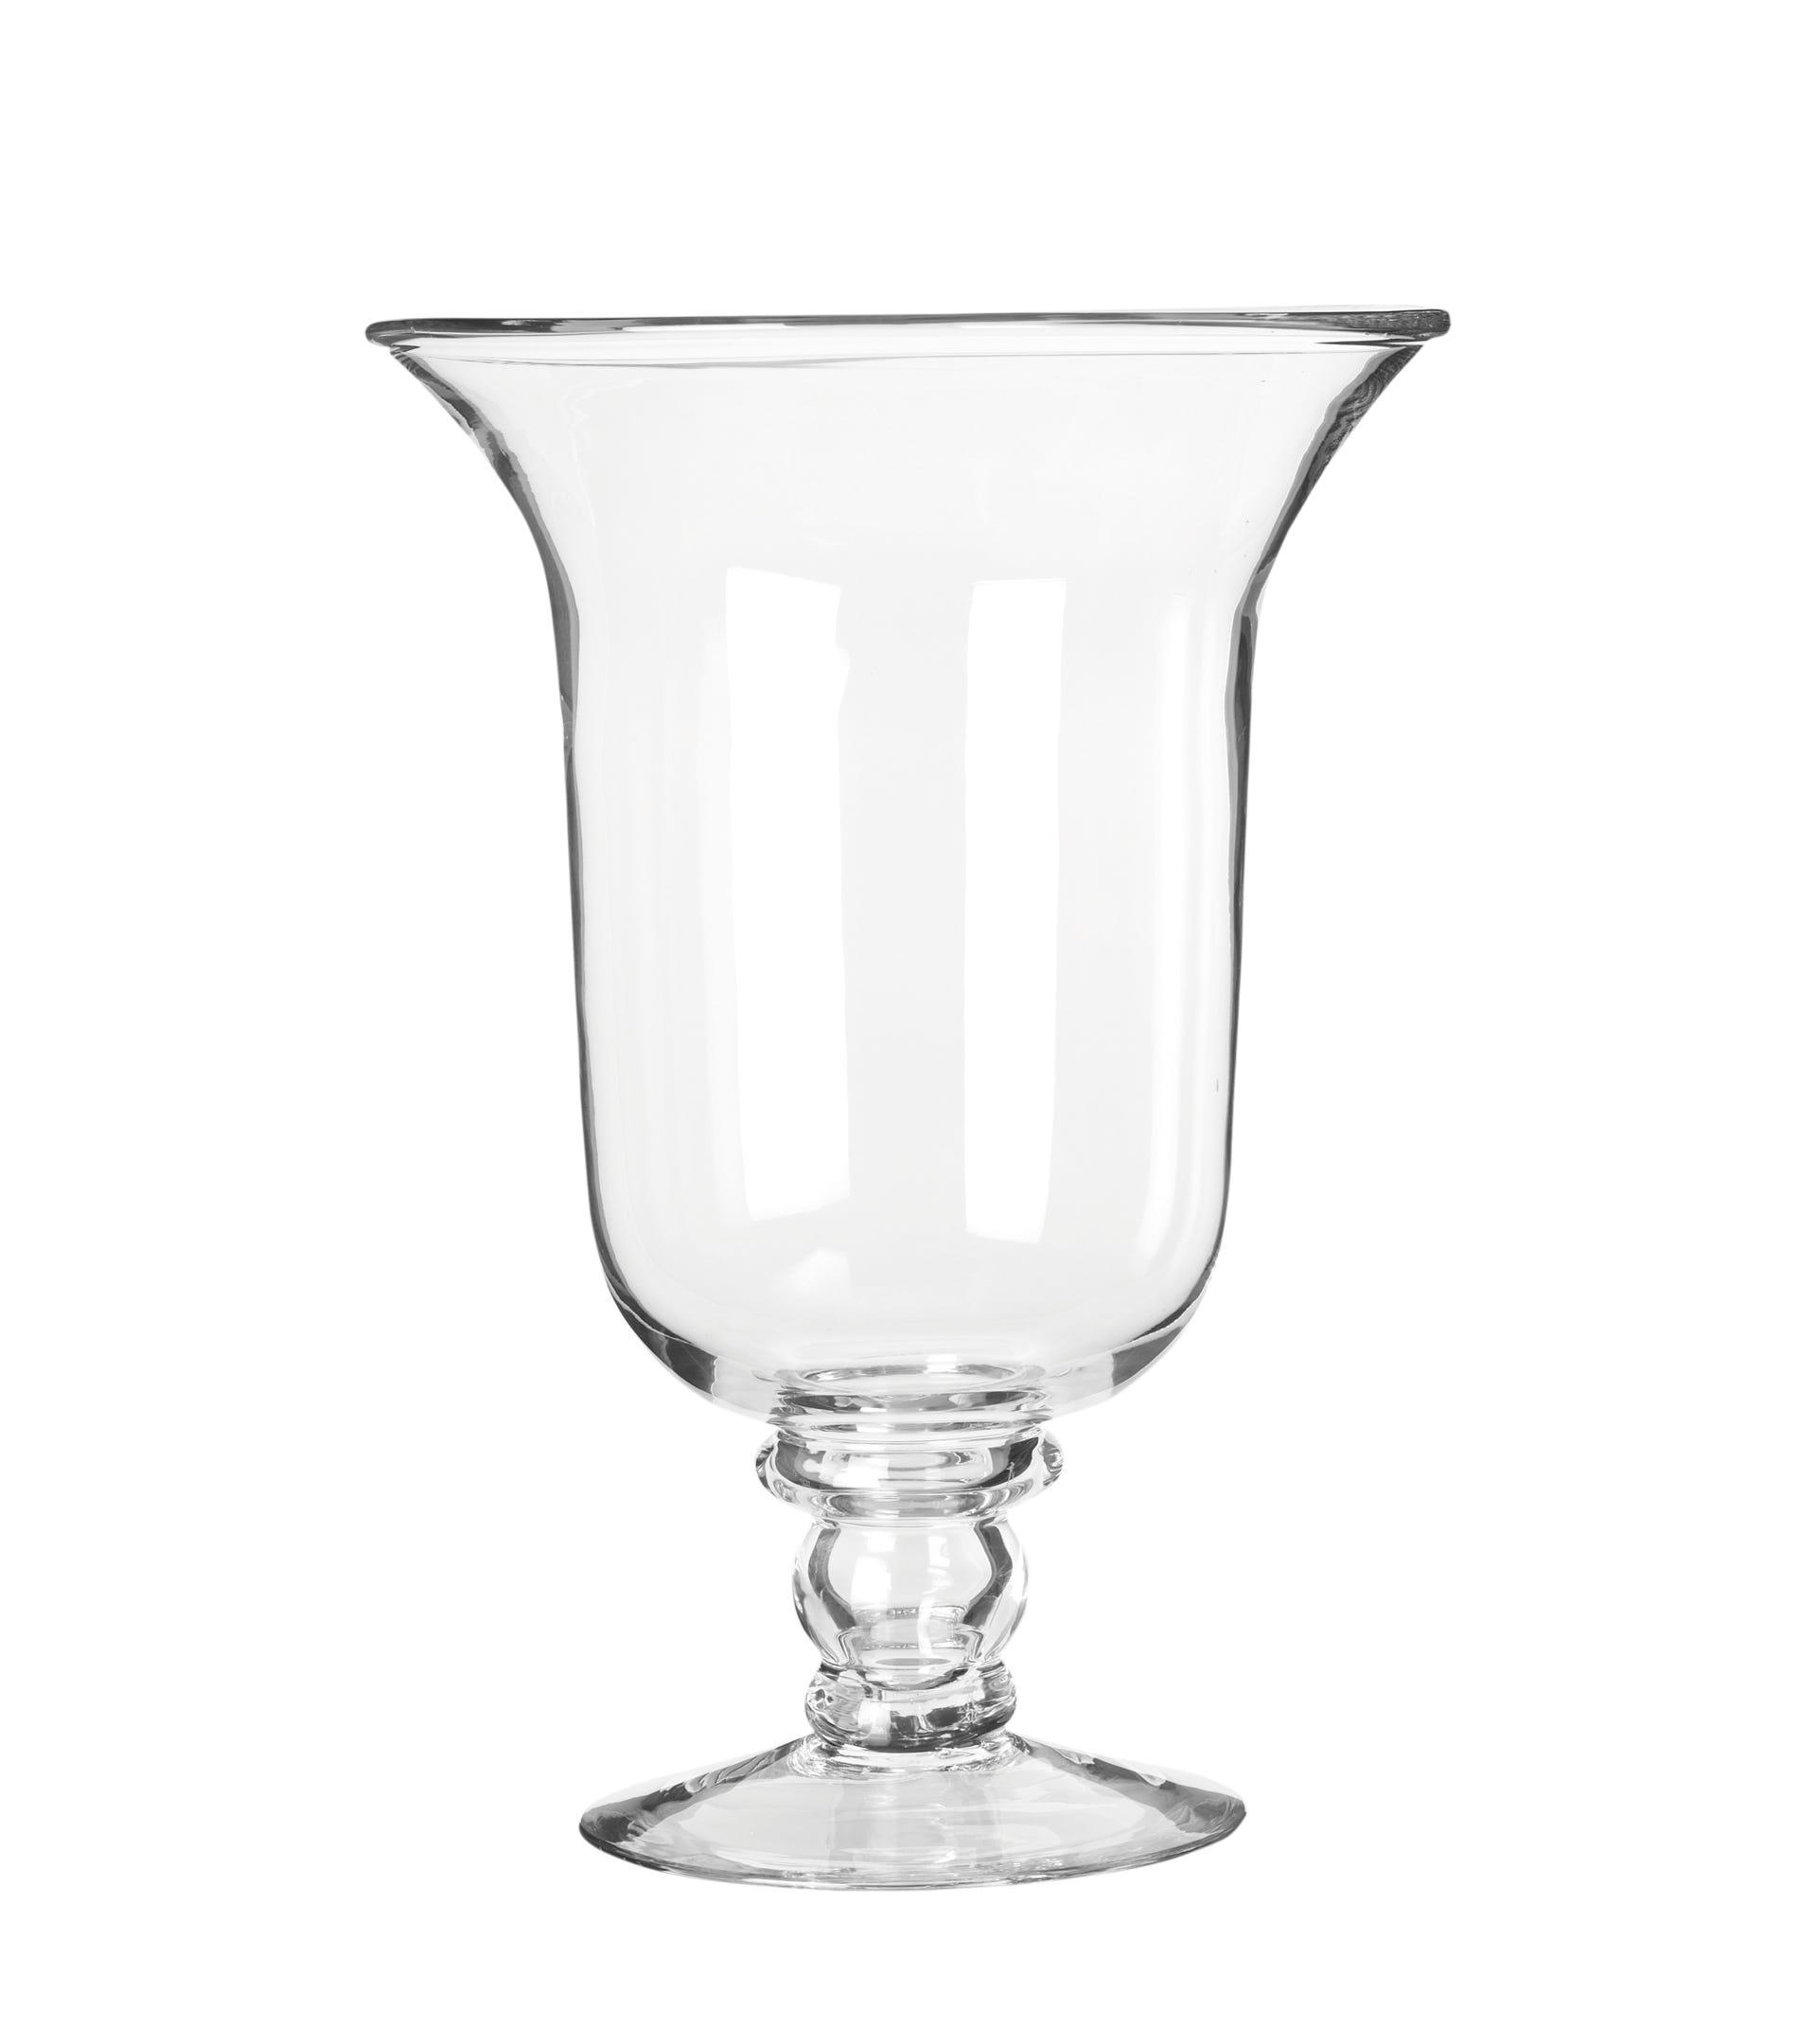 Glass Hurricane Lamp Medium Clear, Large Decorative Hurricane Lamps